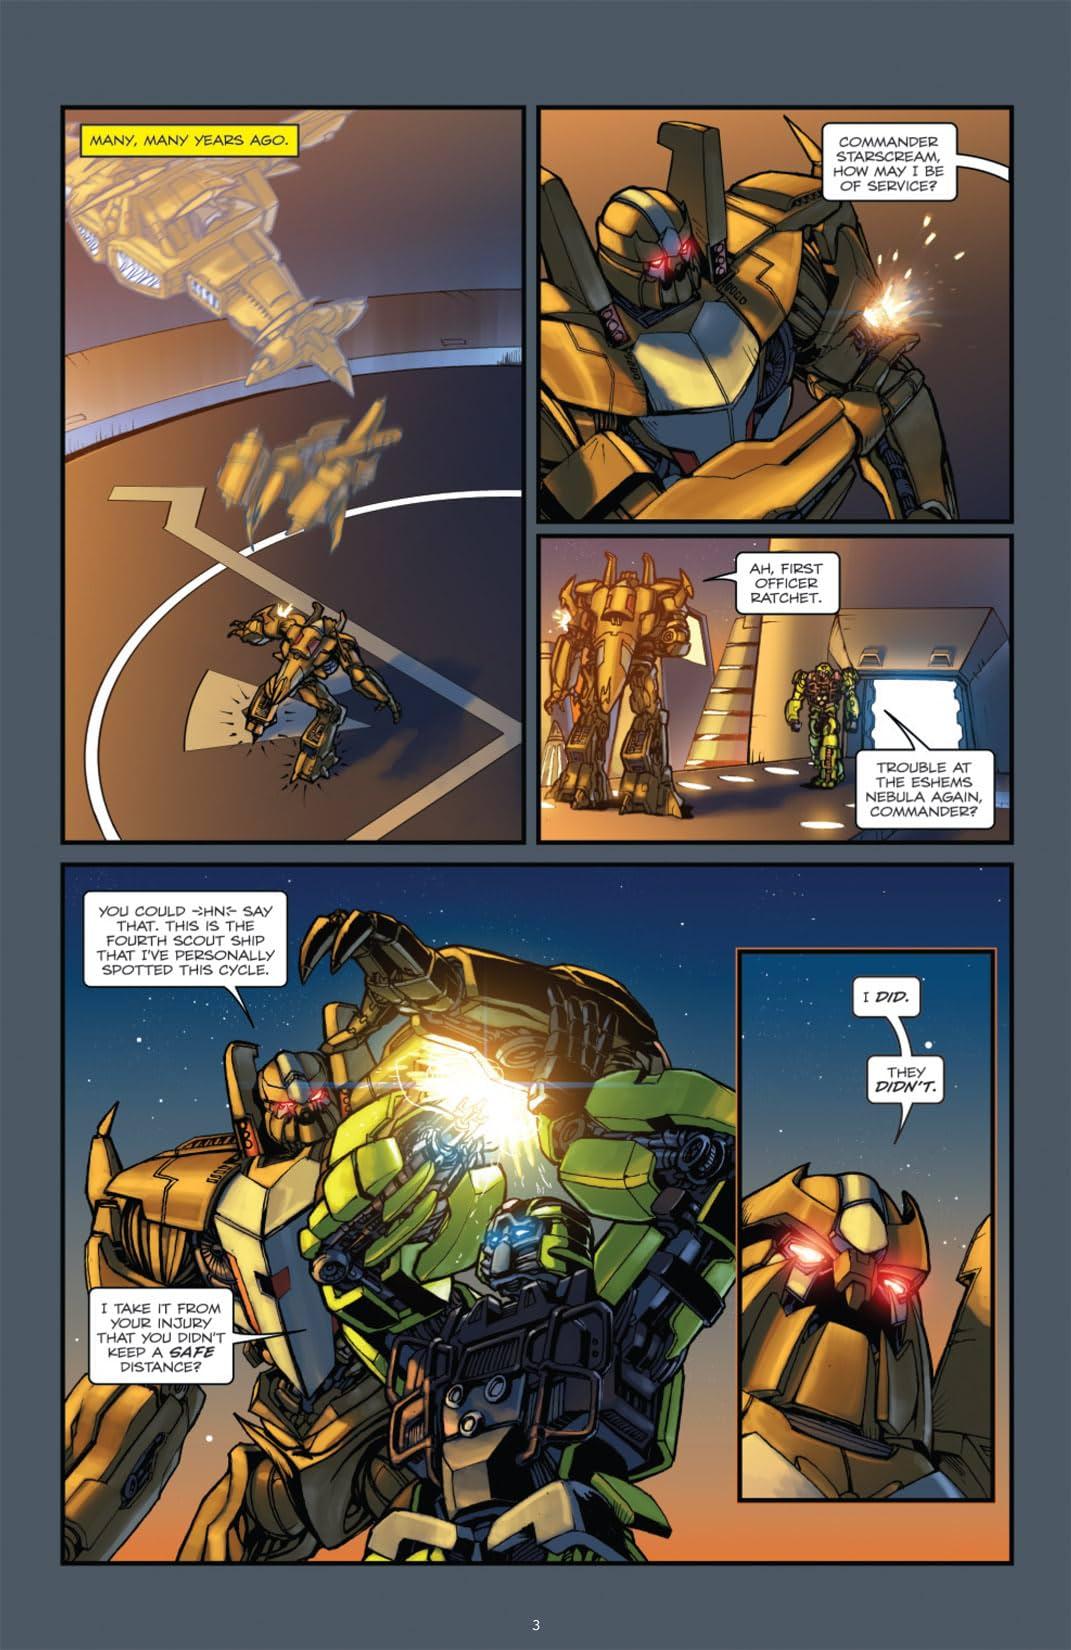 Transformers: Defiance - The Revenge of the Fallen Movie Prequel #1